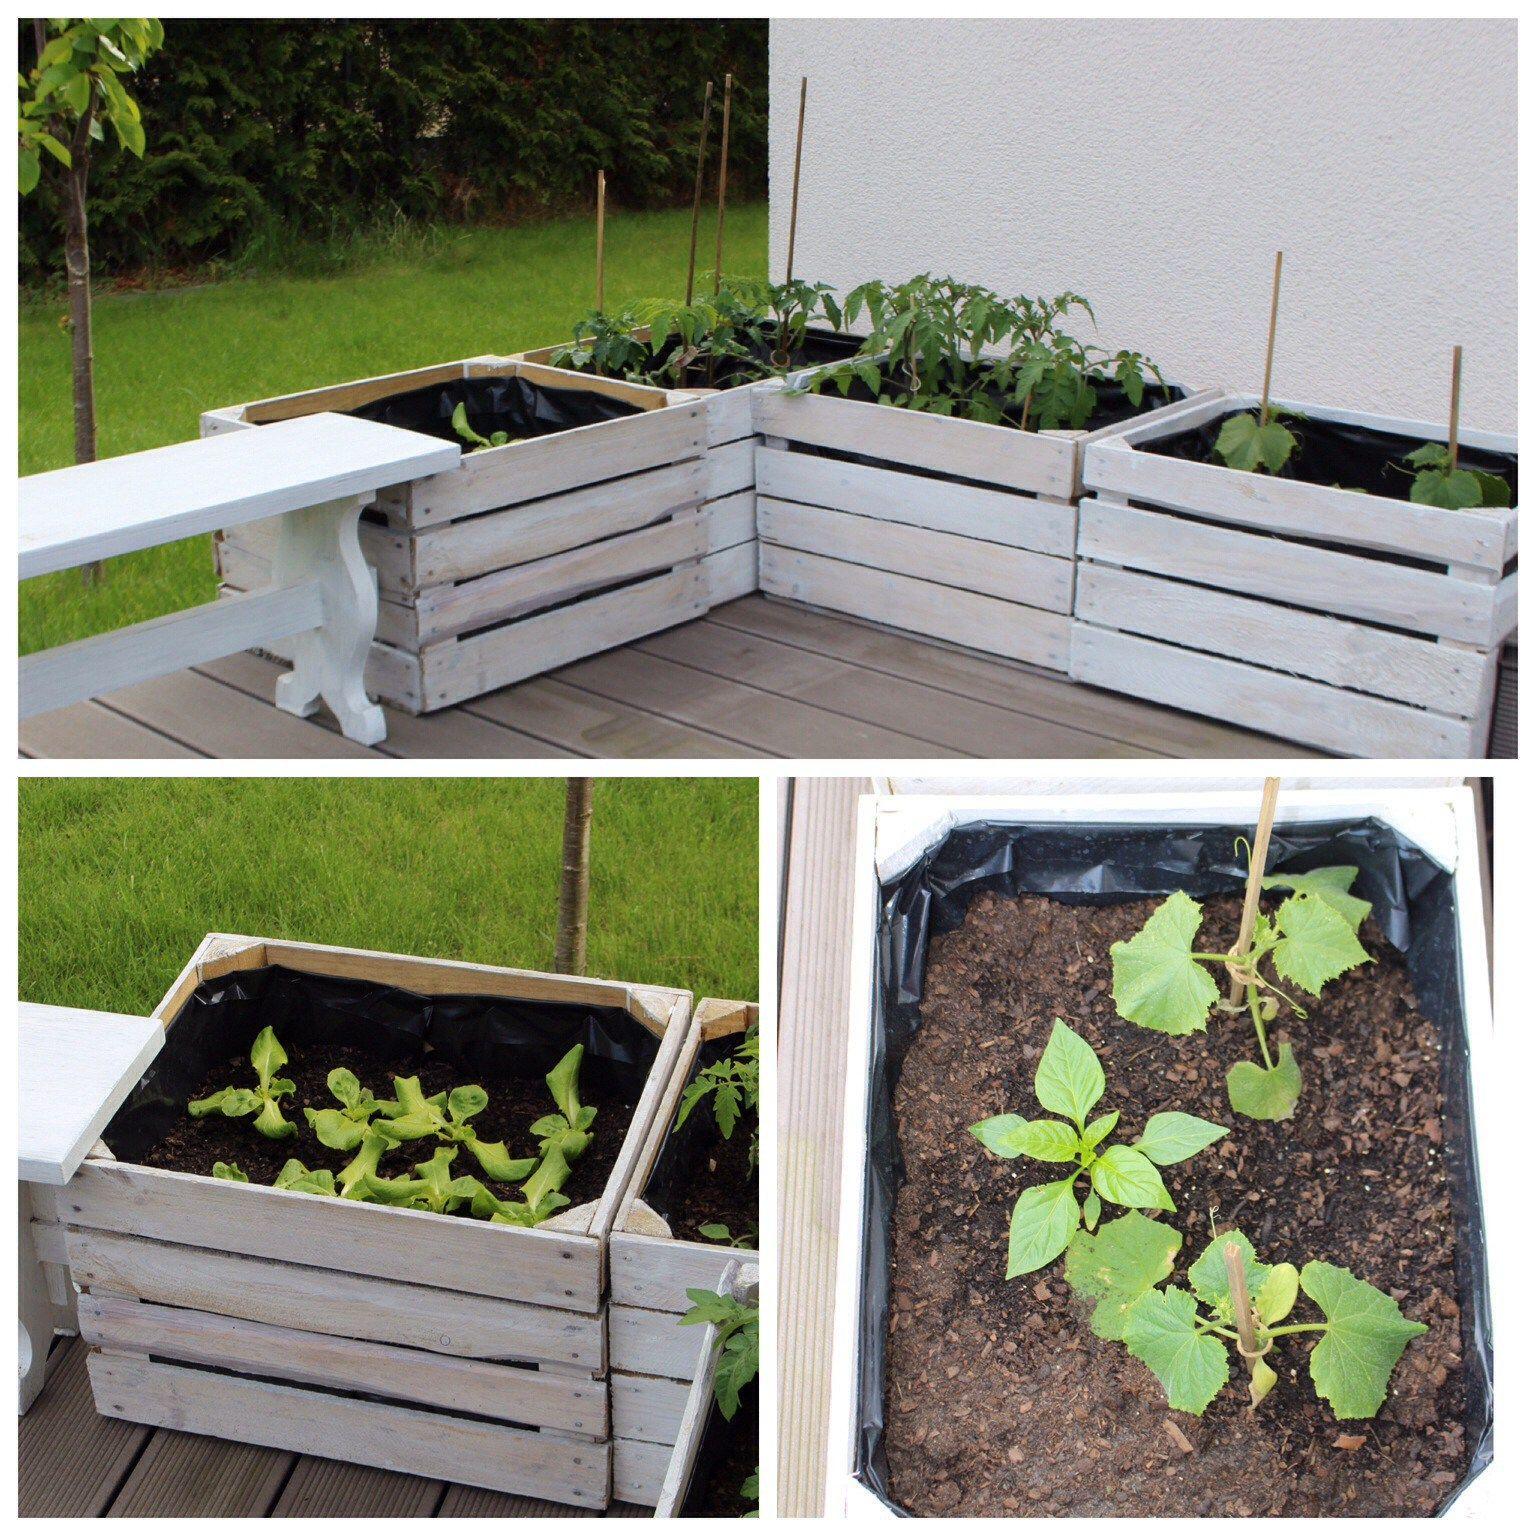 Alte Apfelkisten Hochbeet Gemuse Upcycling Garten Ideen Kinder